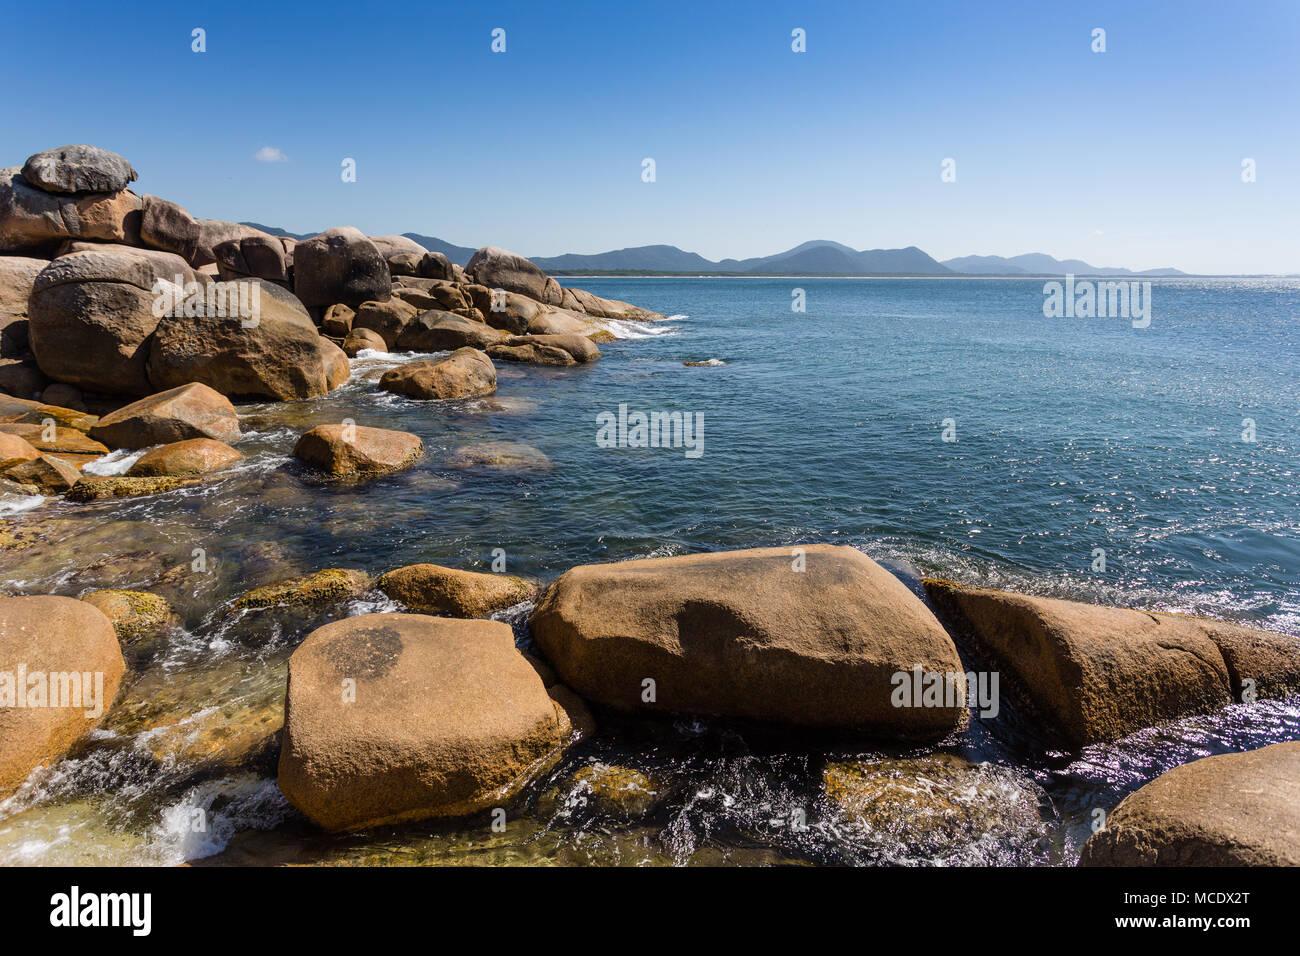 Florianopolis is beautiful - Stock Image